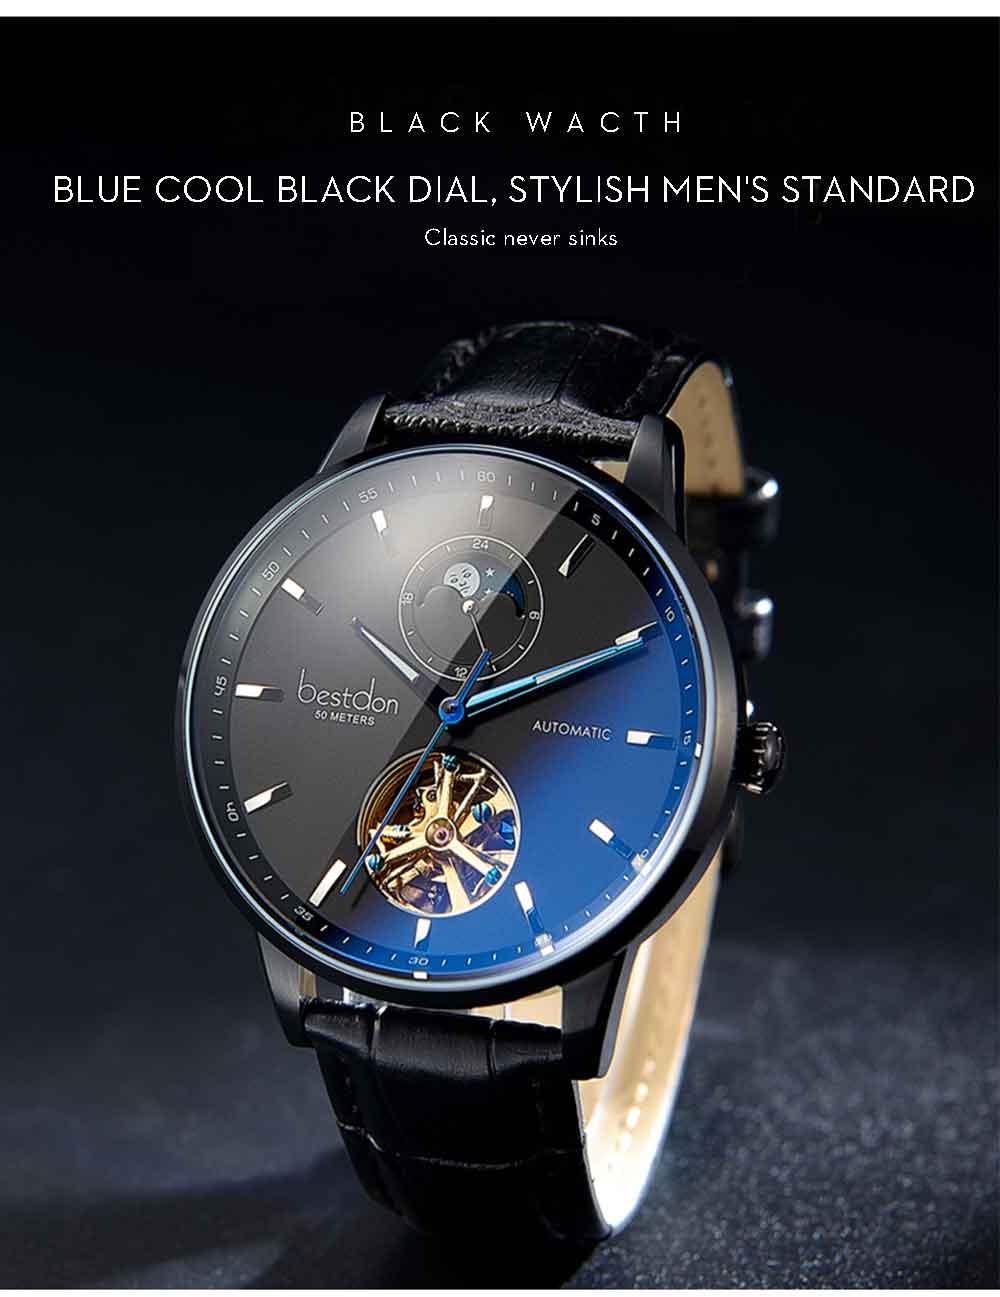 HTB1c K1ajzuK1RjSspeq6ziHVXa4 Bestdon Luxury Mechanical Watch Men Automatic Tourbillon Sports Watches Mens Fashion Switzerland Brand Watch Relogio Masculino